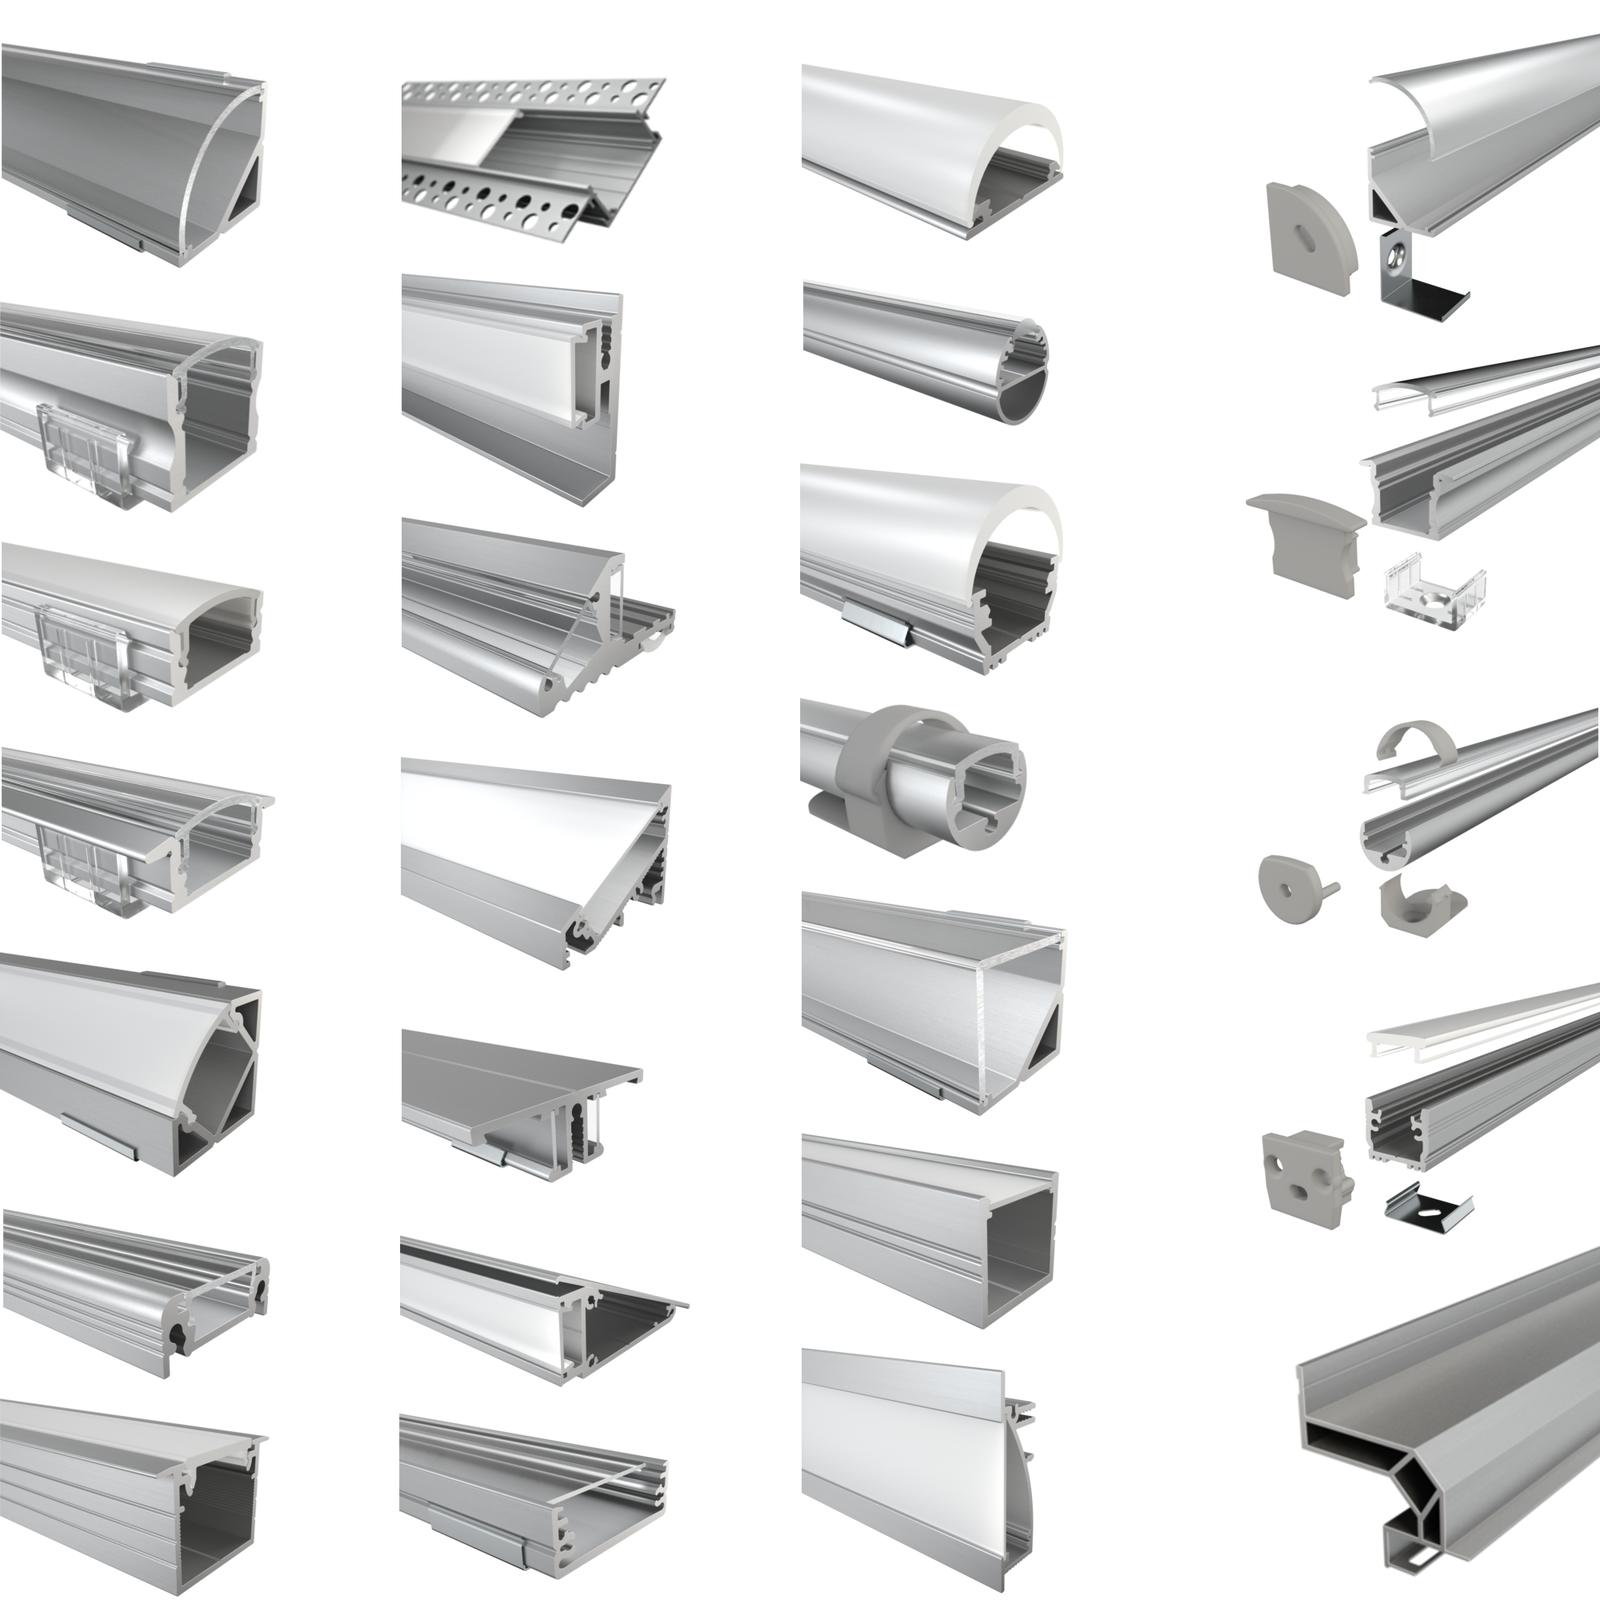 LED Aluprofil Aluminium Profile Leiste Eloxiert für LED-Streifen 2m